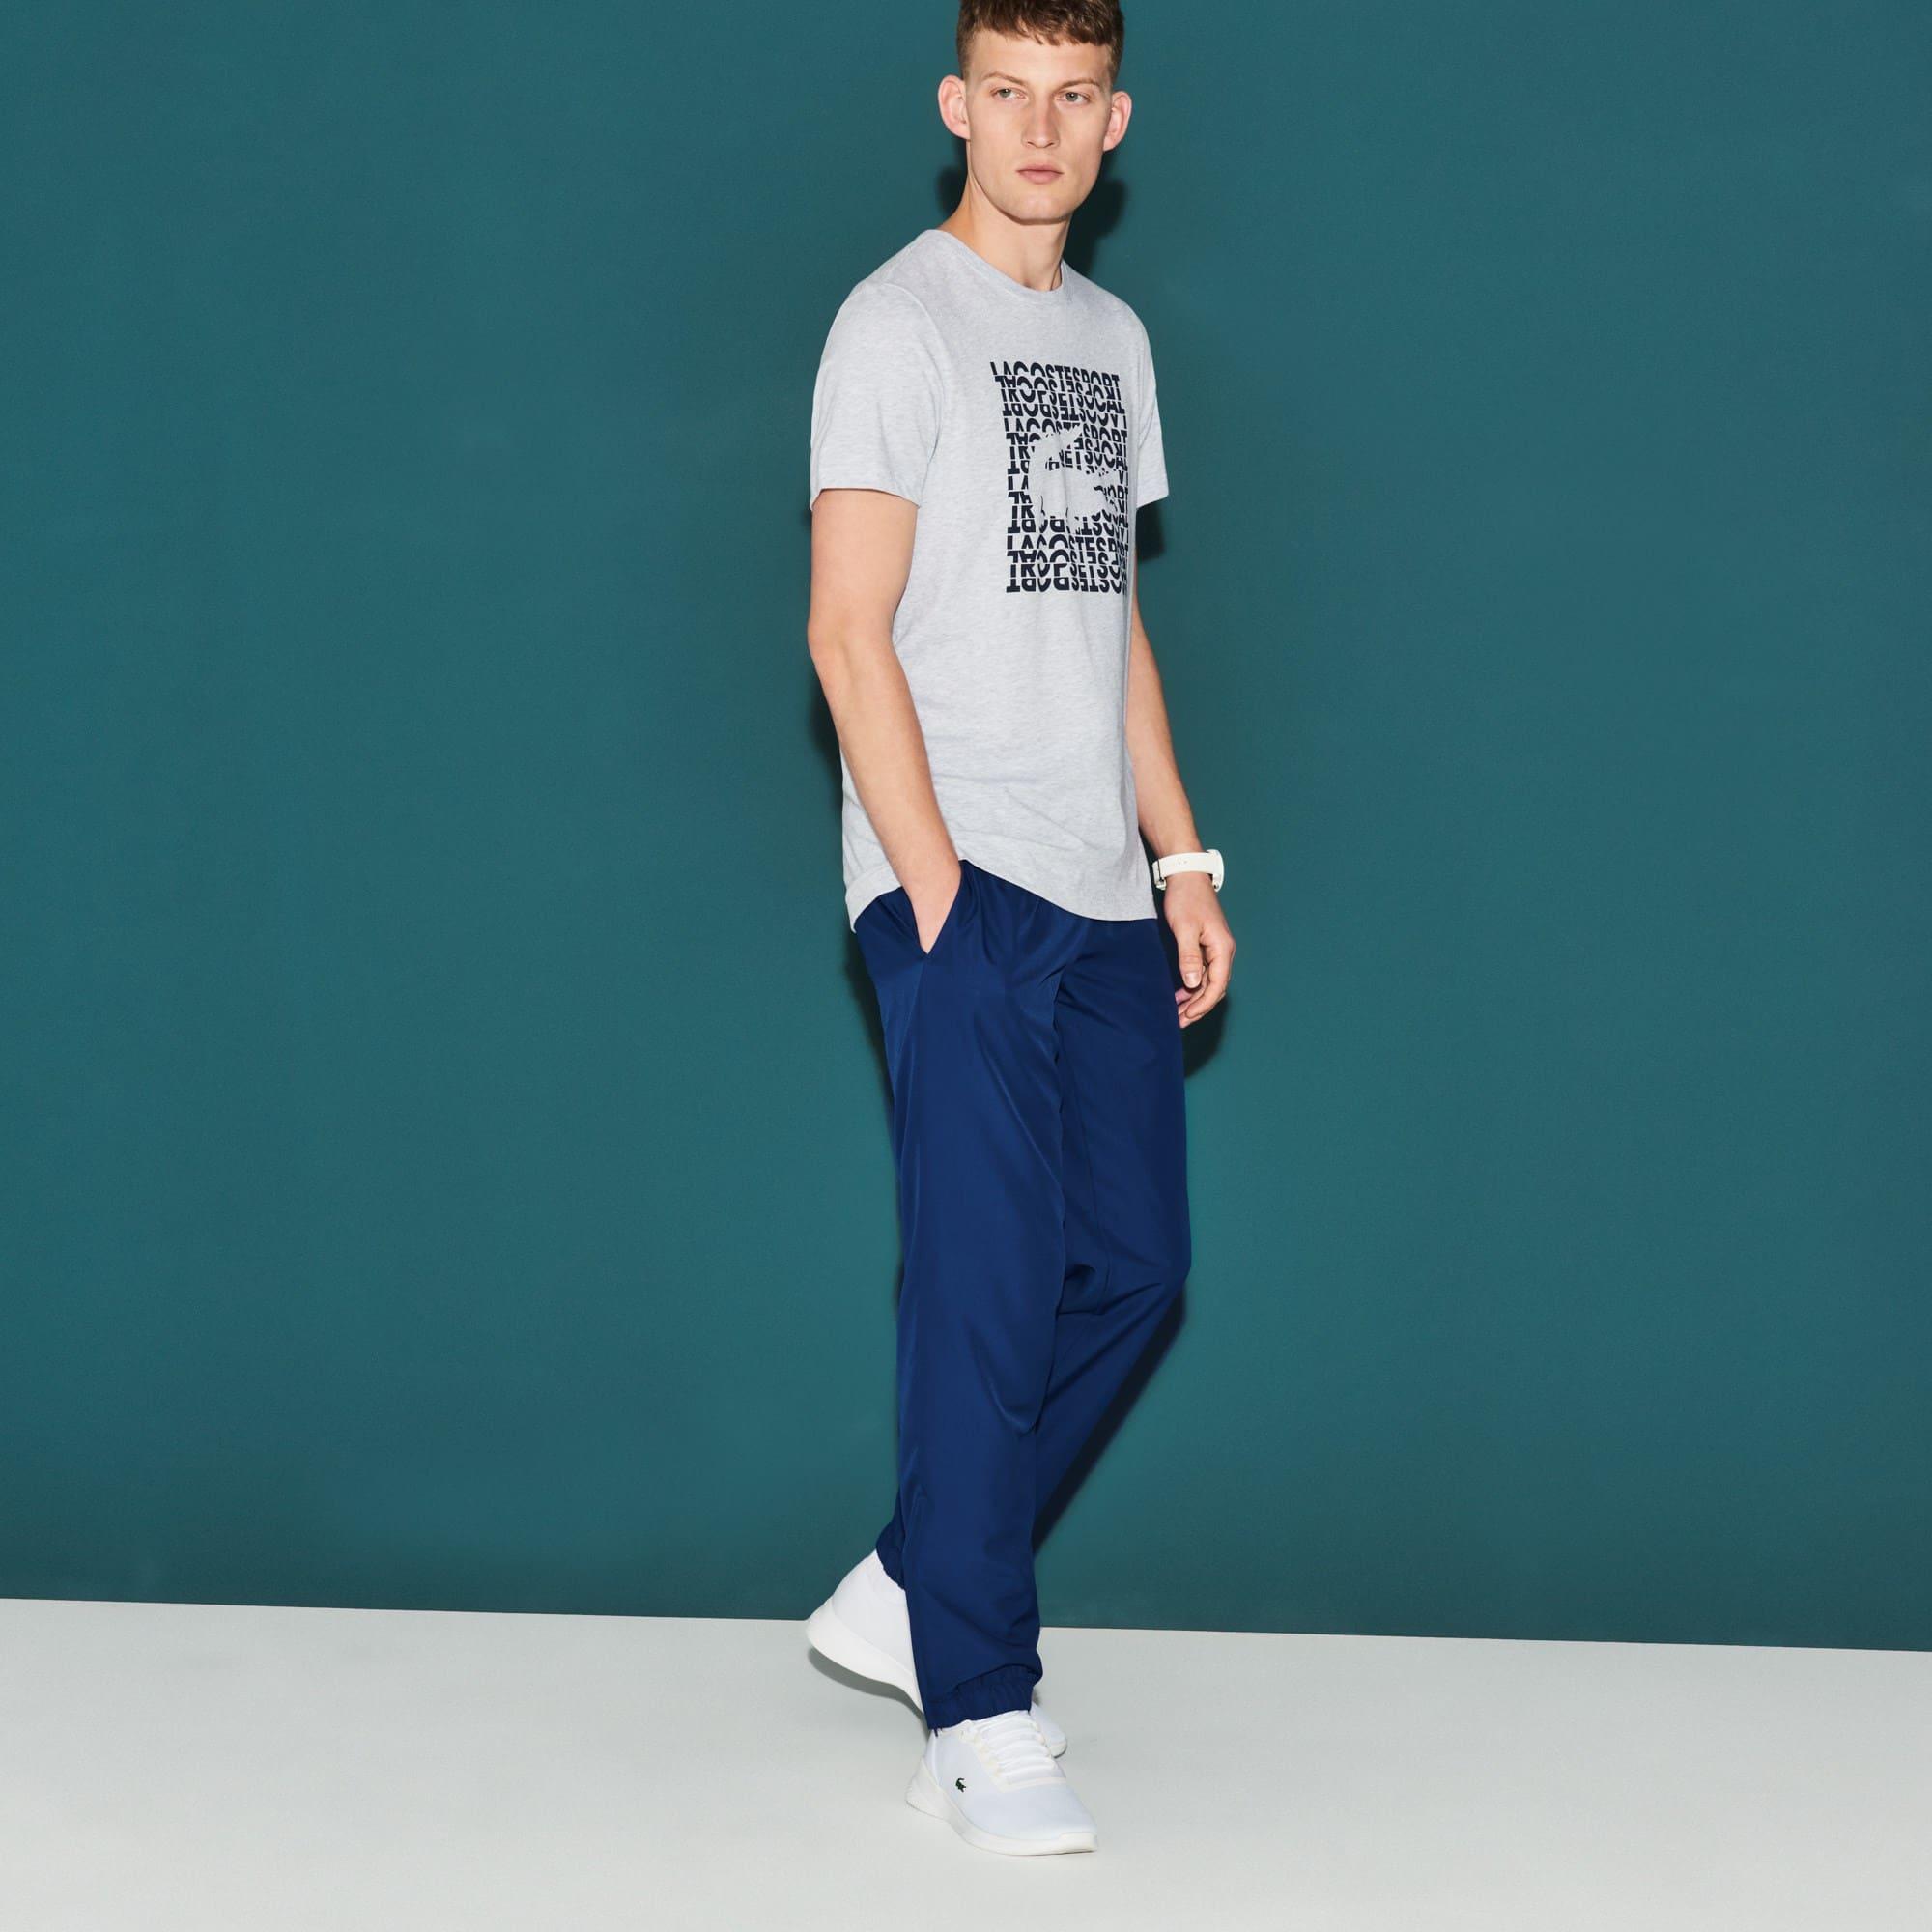 Men's Lacoste SPORT Taffeta Tennis Sweatpants